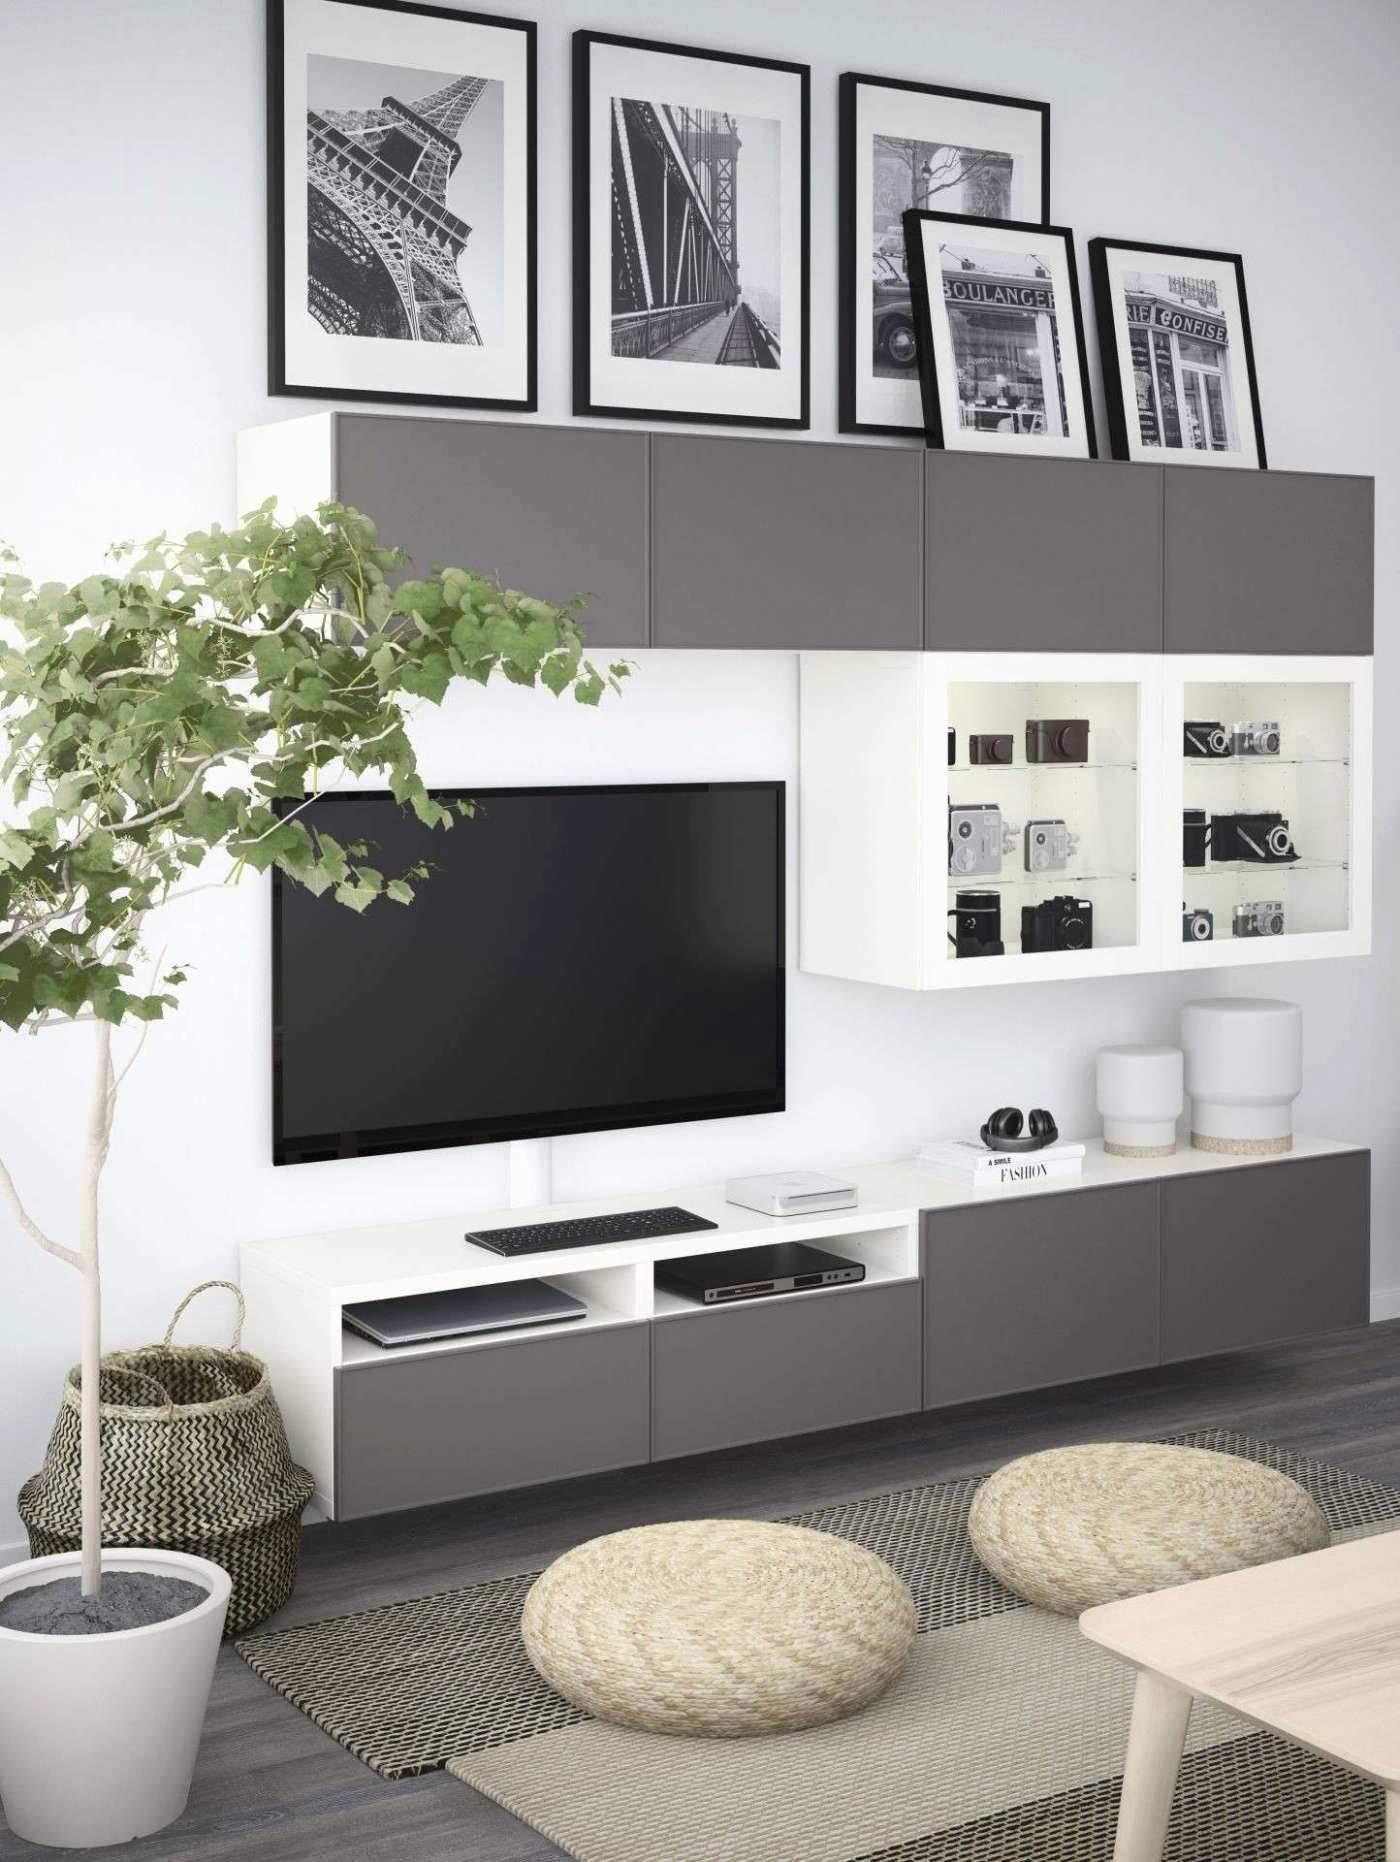 wanddeko ideen wohnzimmer neu 55 genial deko ideen selbermachen wohnzimmer neu of wanddeko ideen wohnzimmer